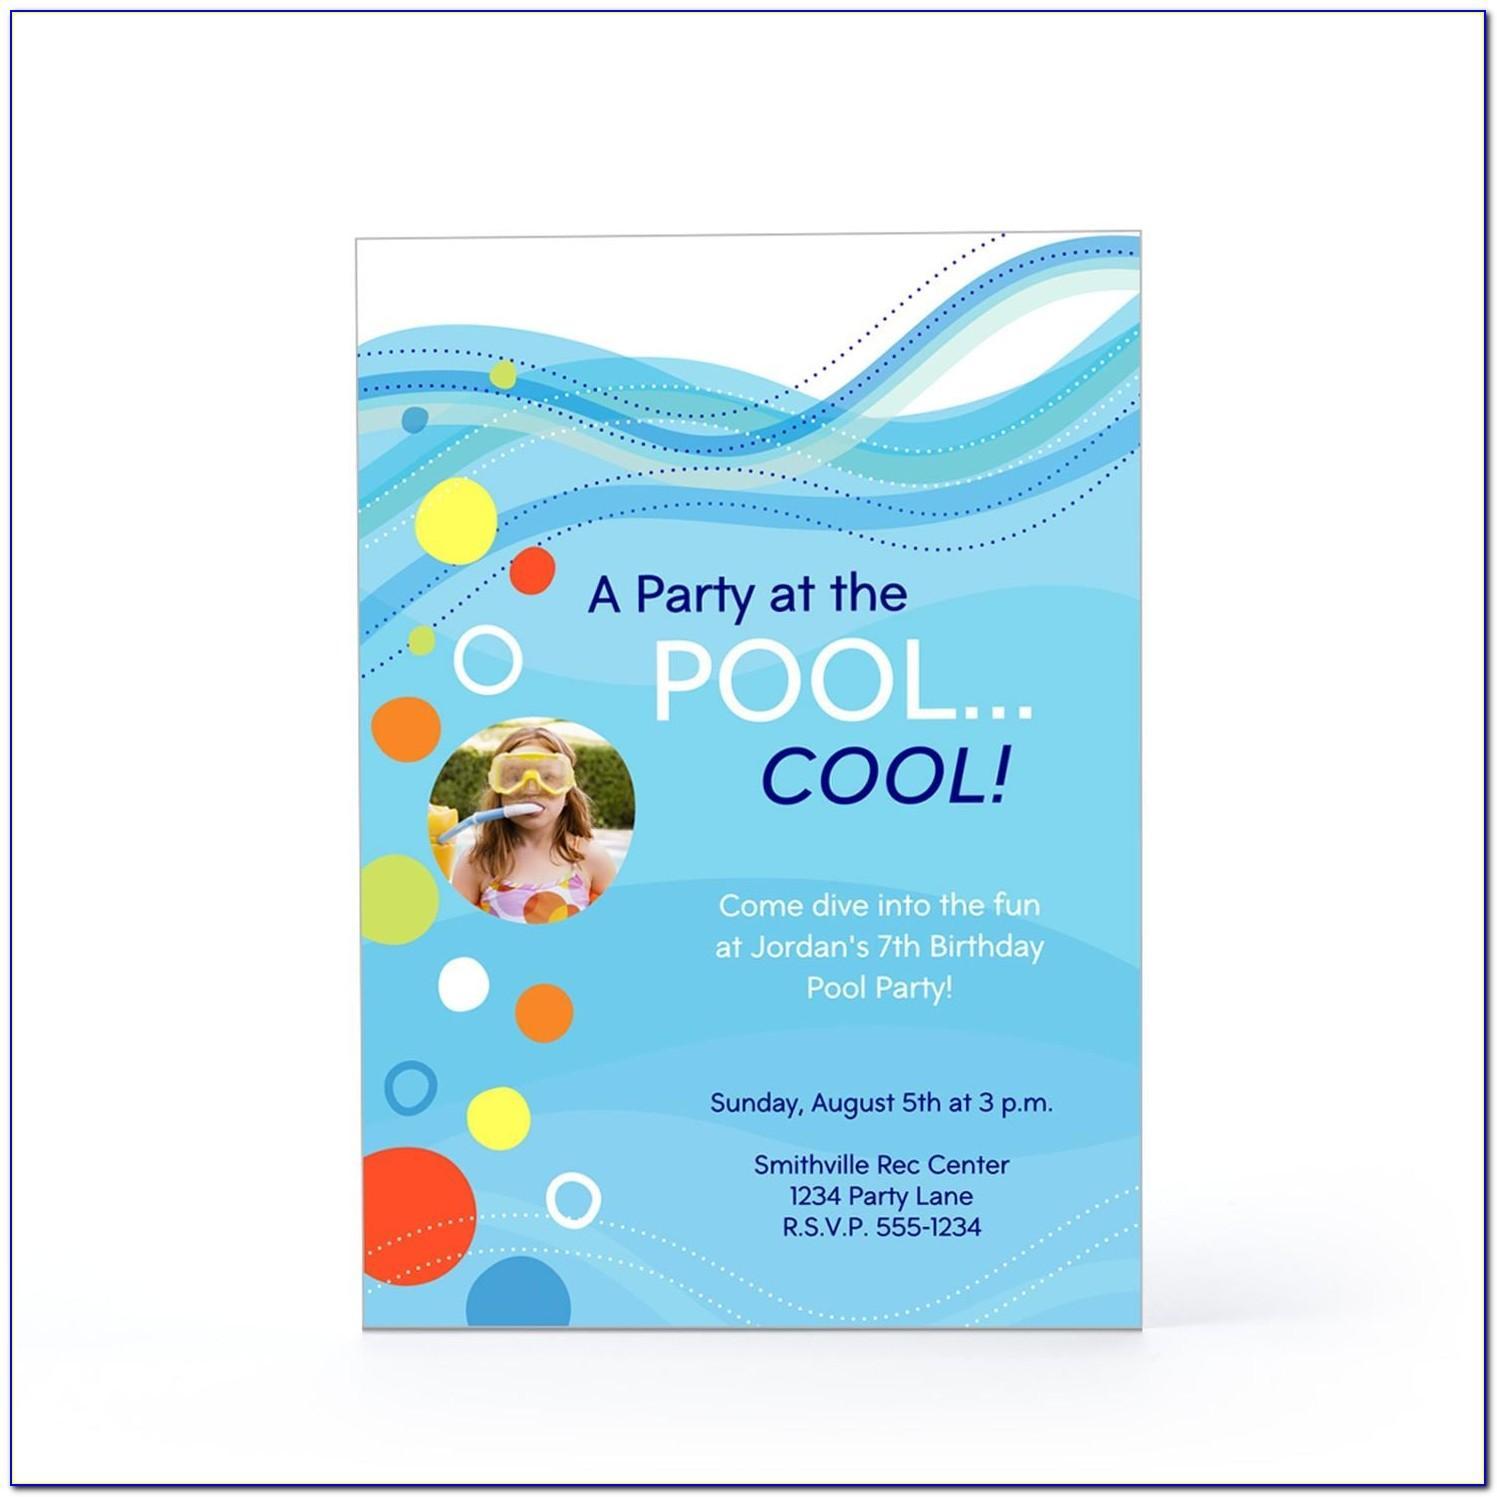 Hallmark Party Invitations Templates